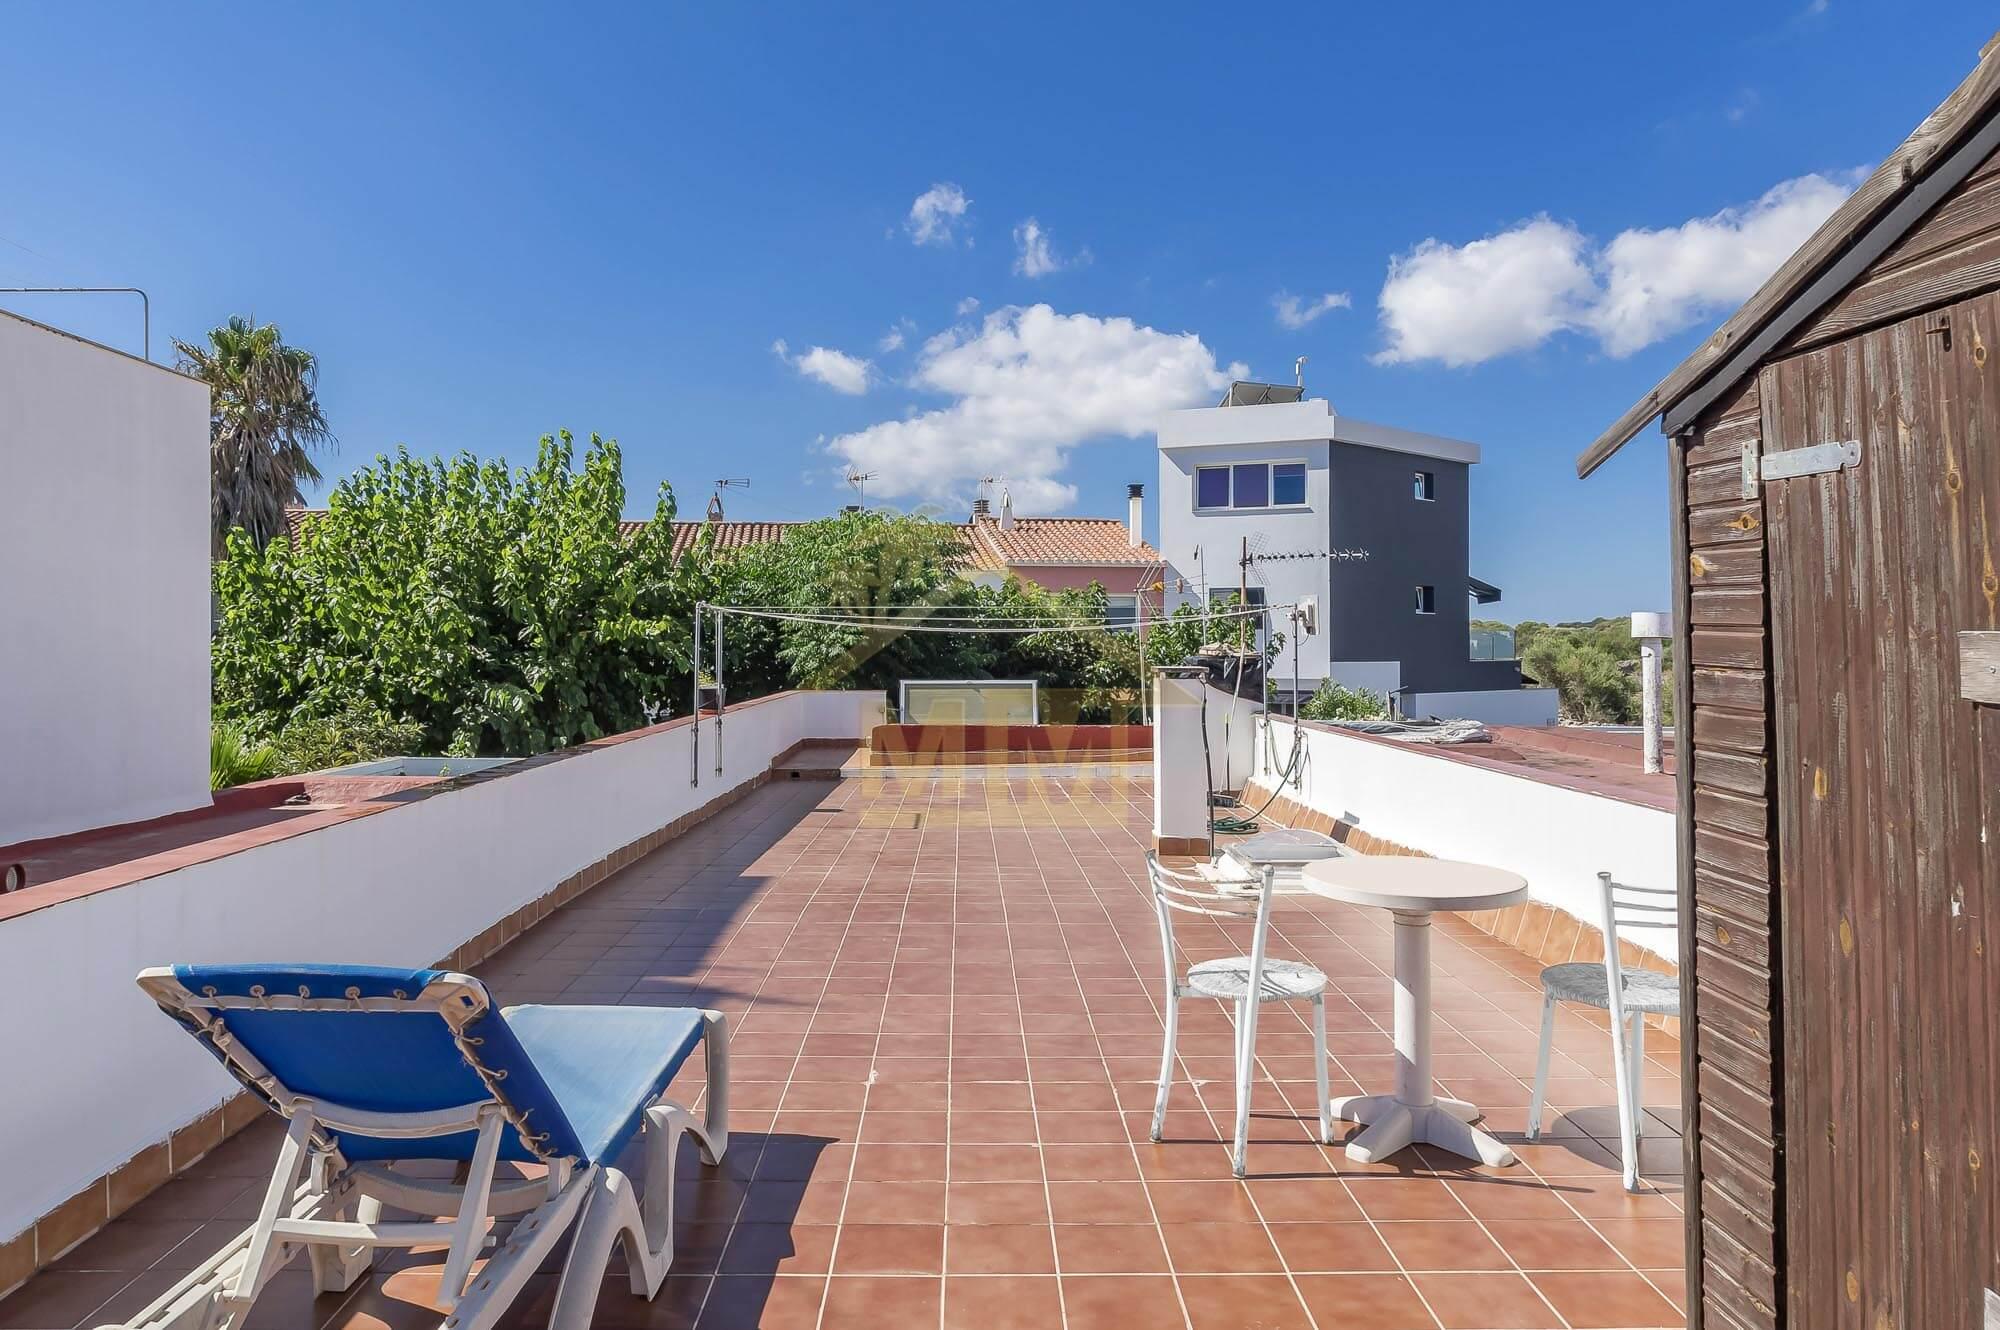 Son Vilar| Terraced house in quiet area